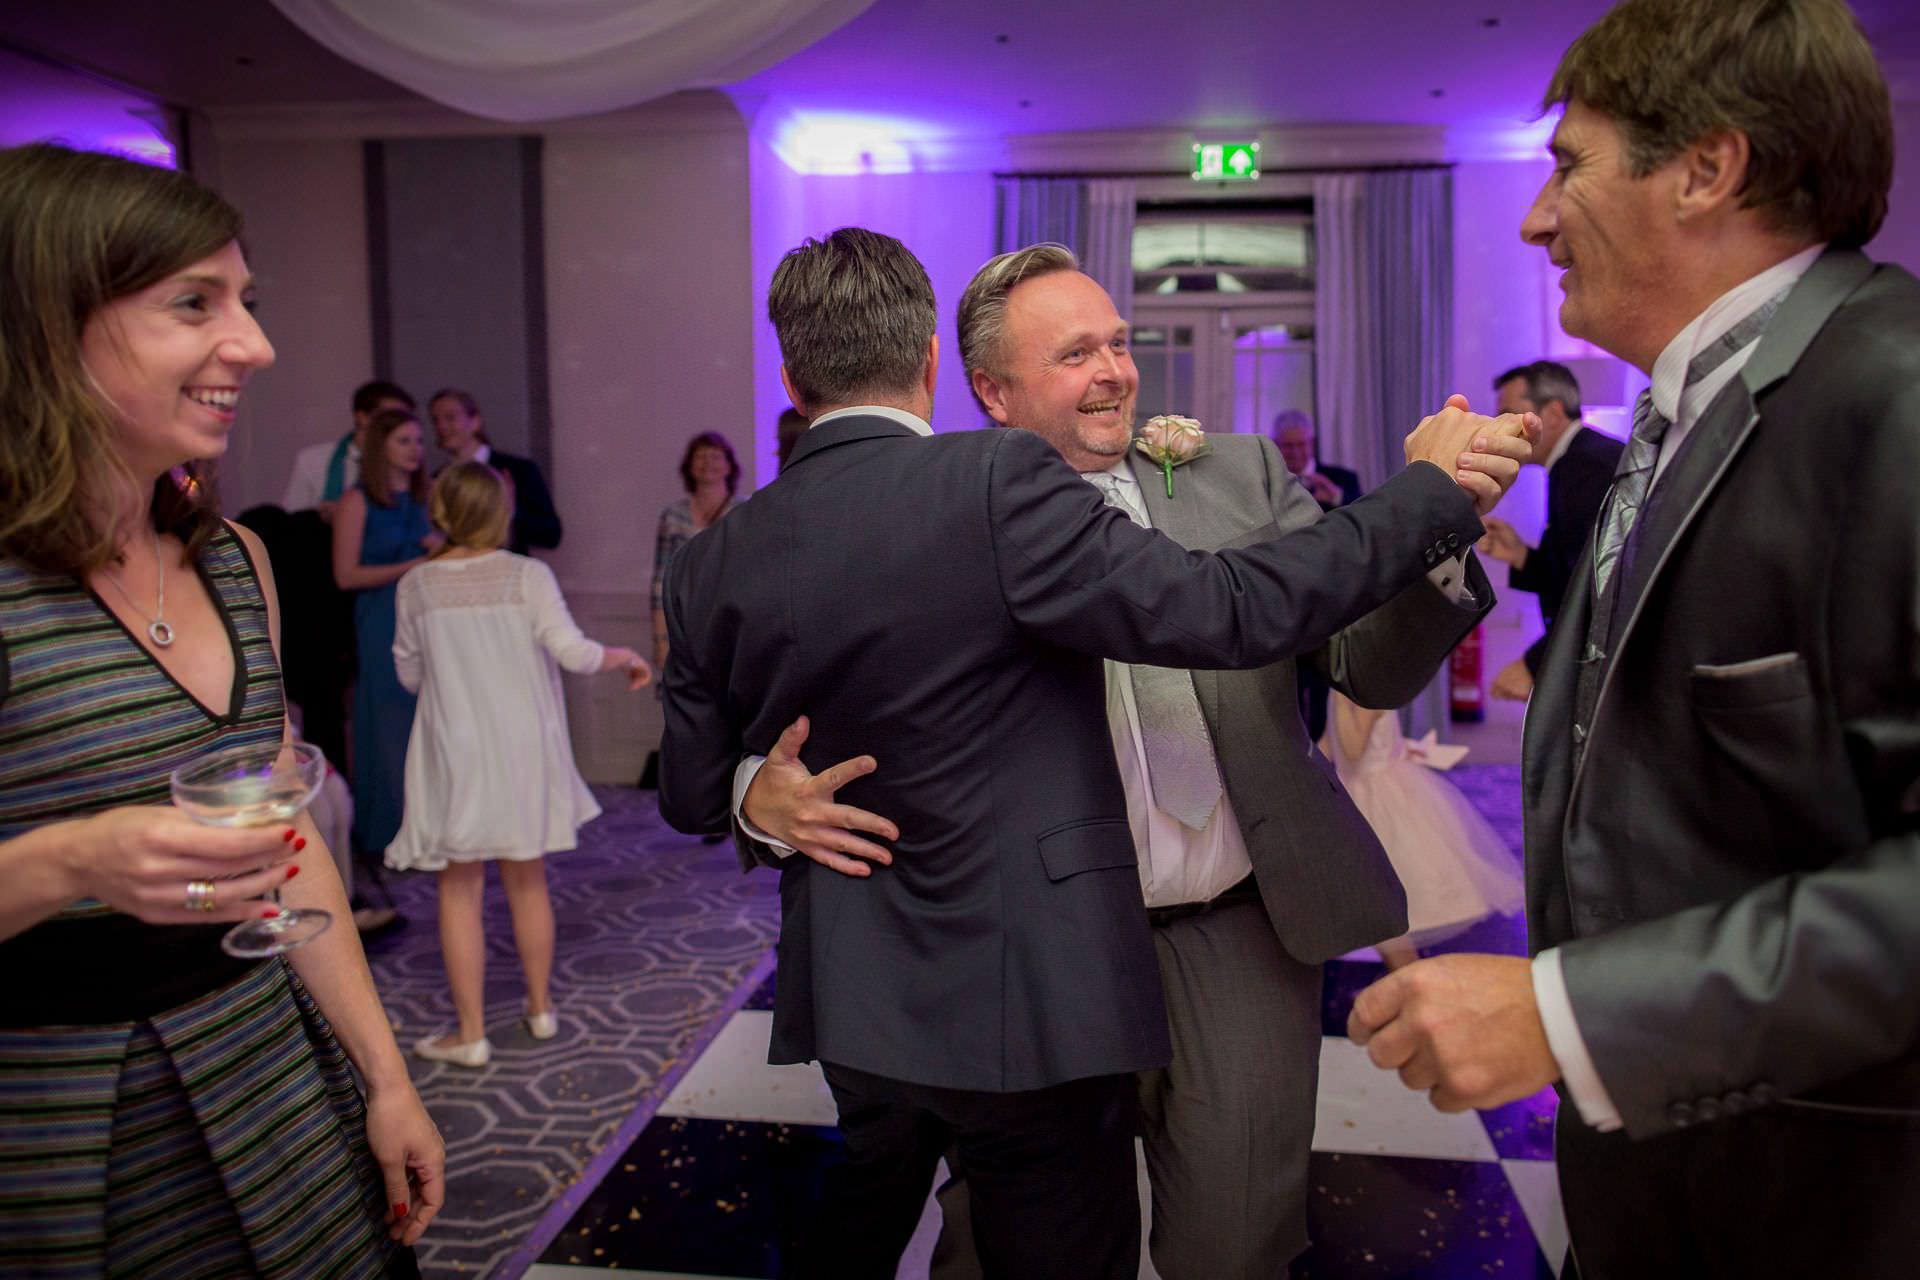 Wotton House wedding father of the groom dancing